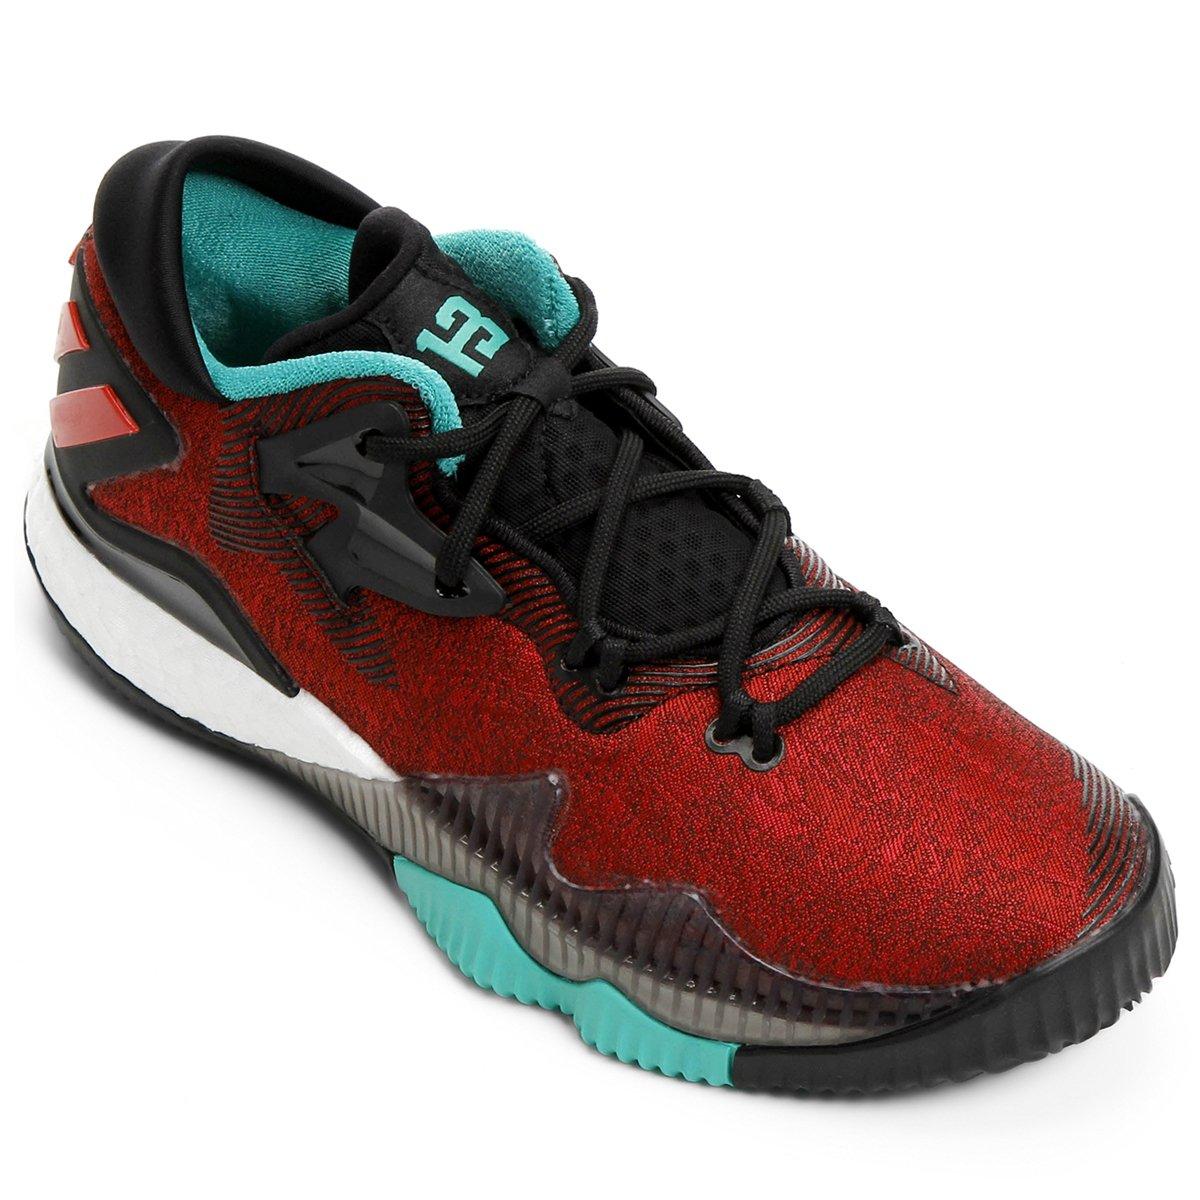 Tênis Adidas Crazylight Boost Low 0747e9d689c1b